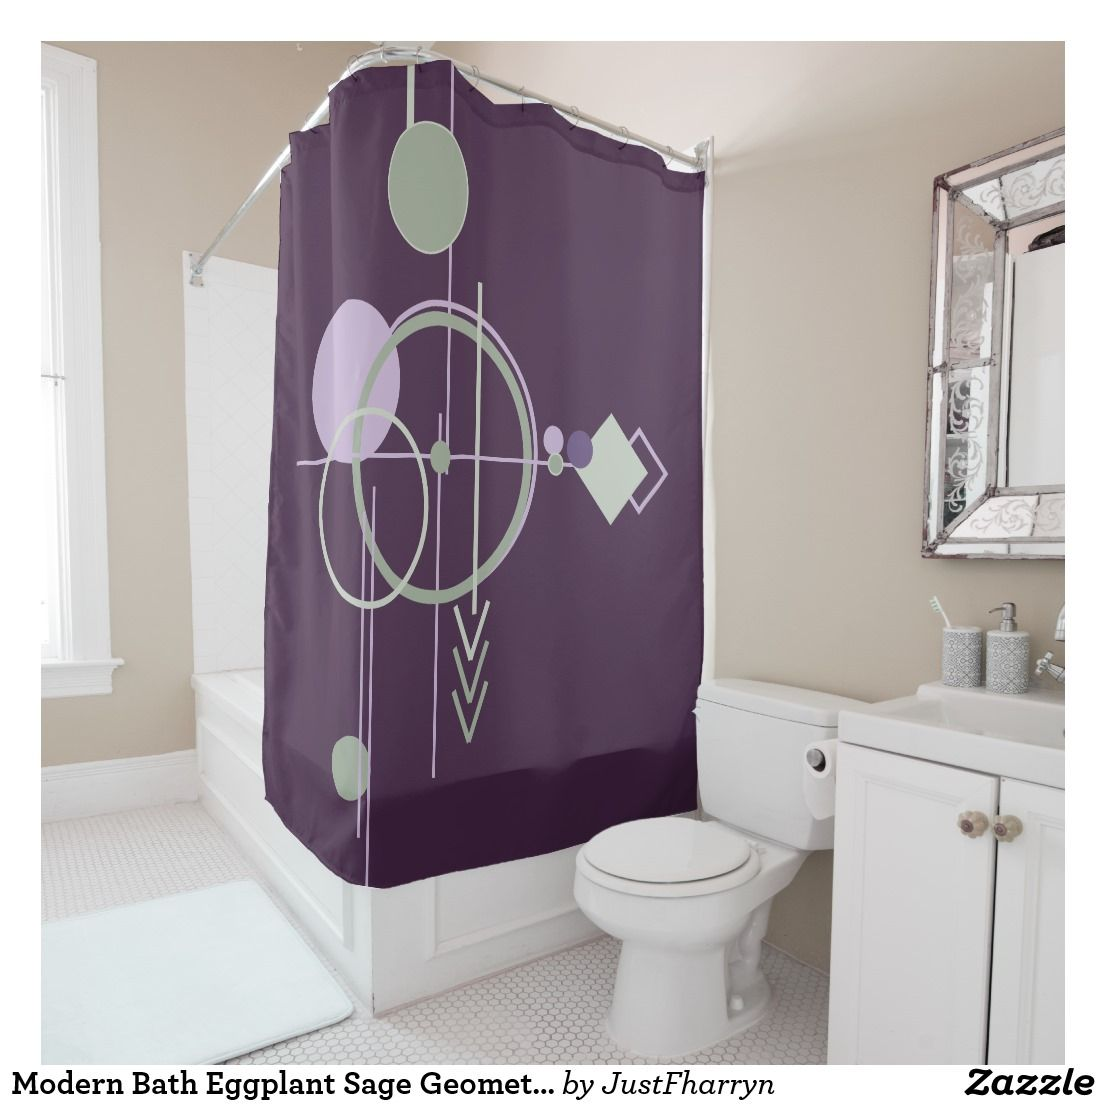 Modern Bath Eggplant Sage Geometric Shape Line Art Shower Curtain